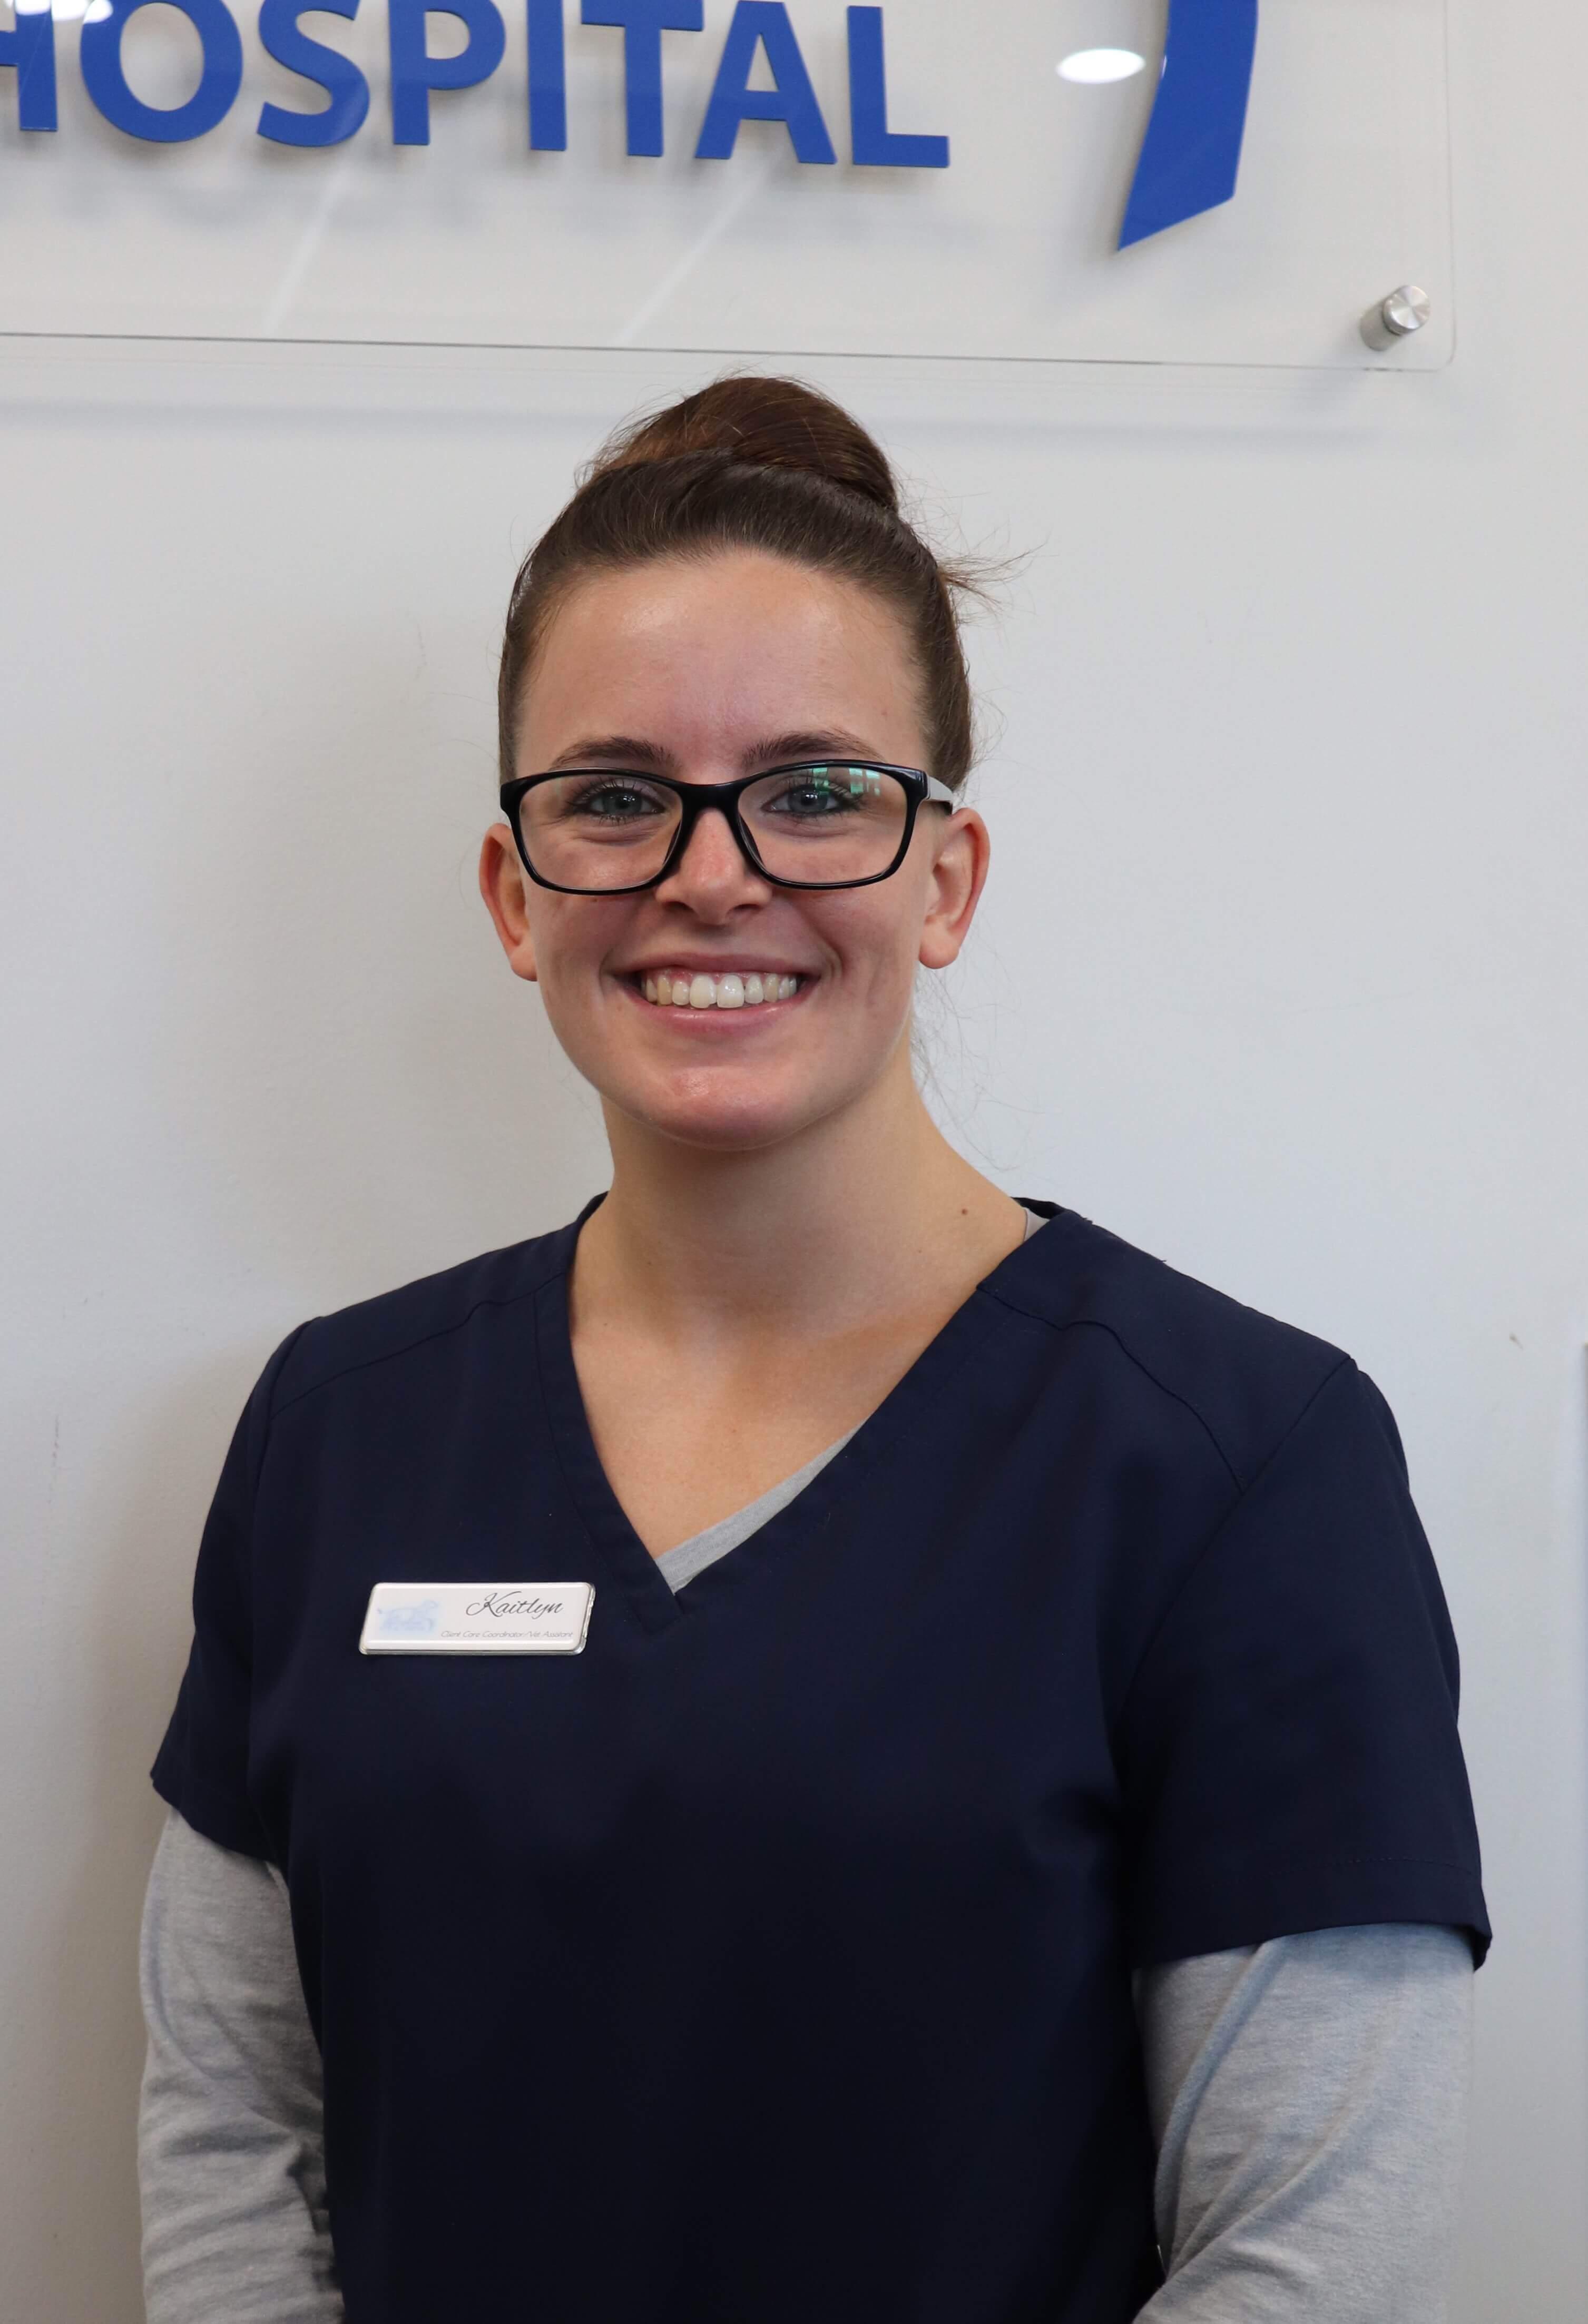 Kaitlyn, Client Care Coordinator